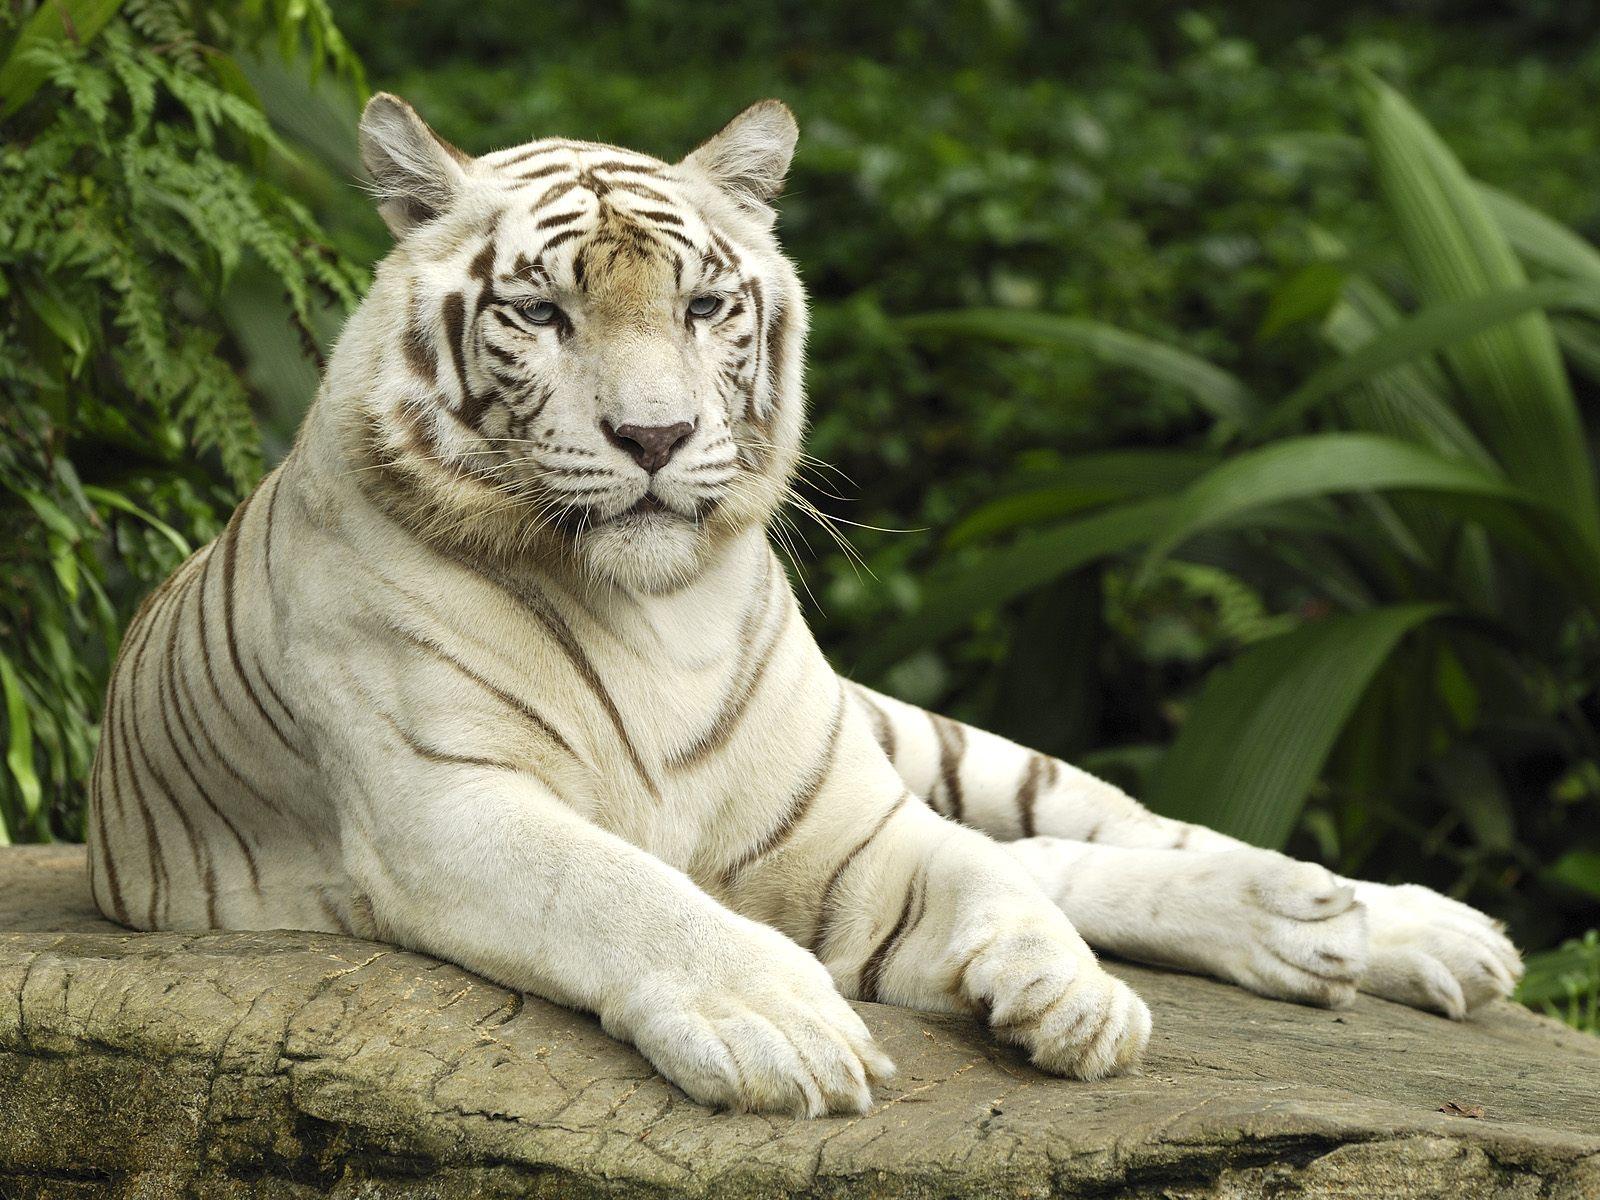 white bengal tigers hd wallpaper 2013 white bengal tigers hd 1600x1200